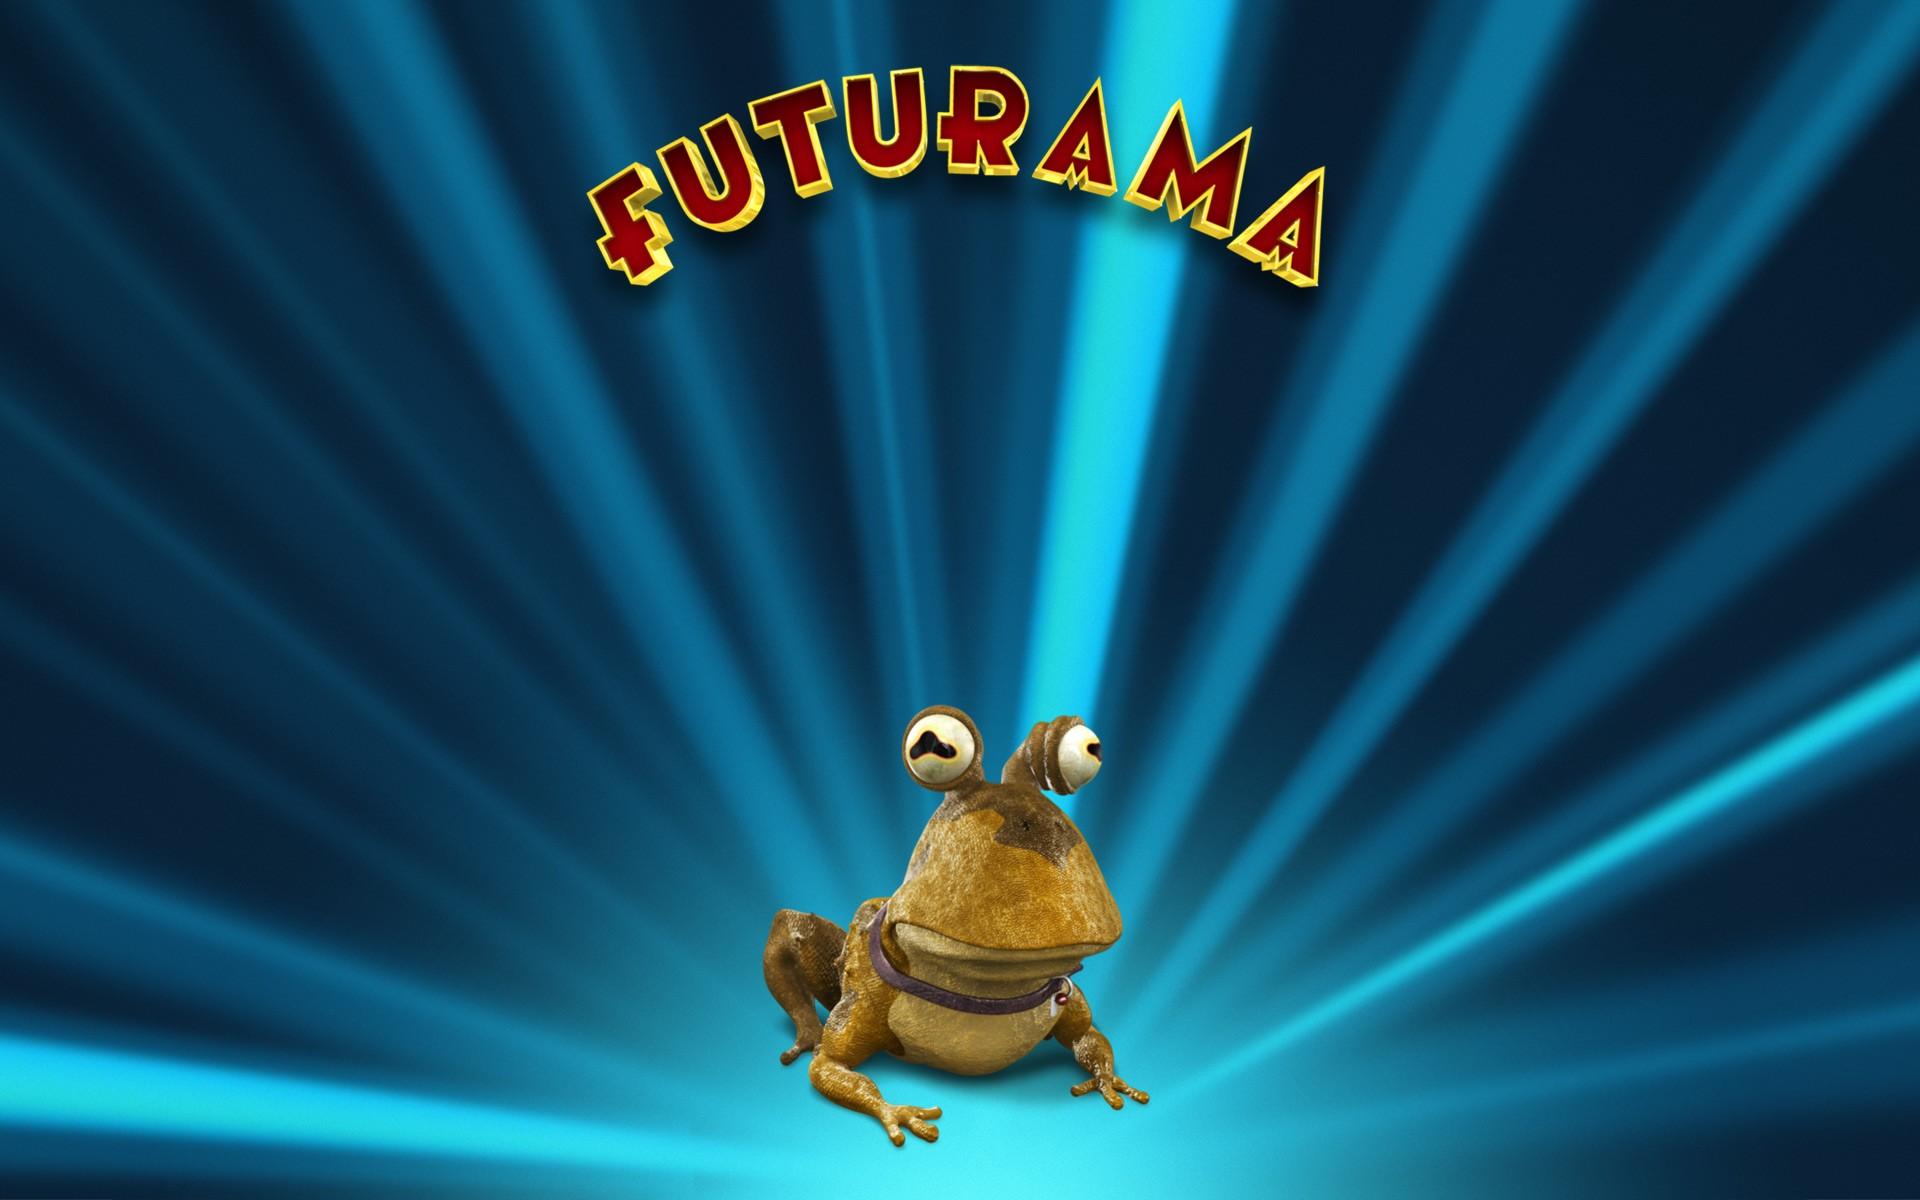 Futurama hd wallpaper background image 1920x1200 id - Futurama wallpaper ...